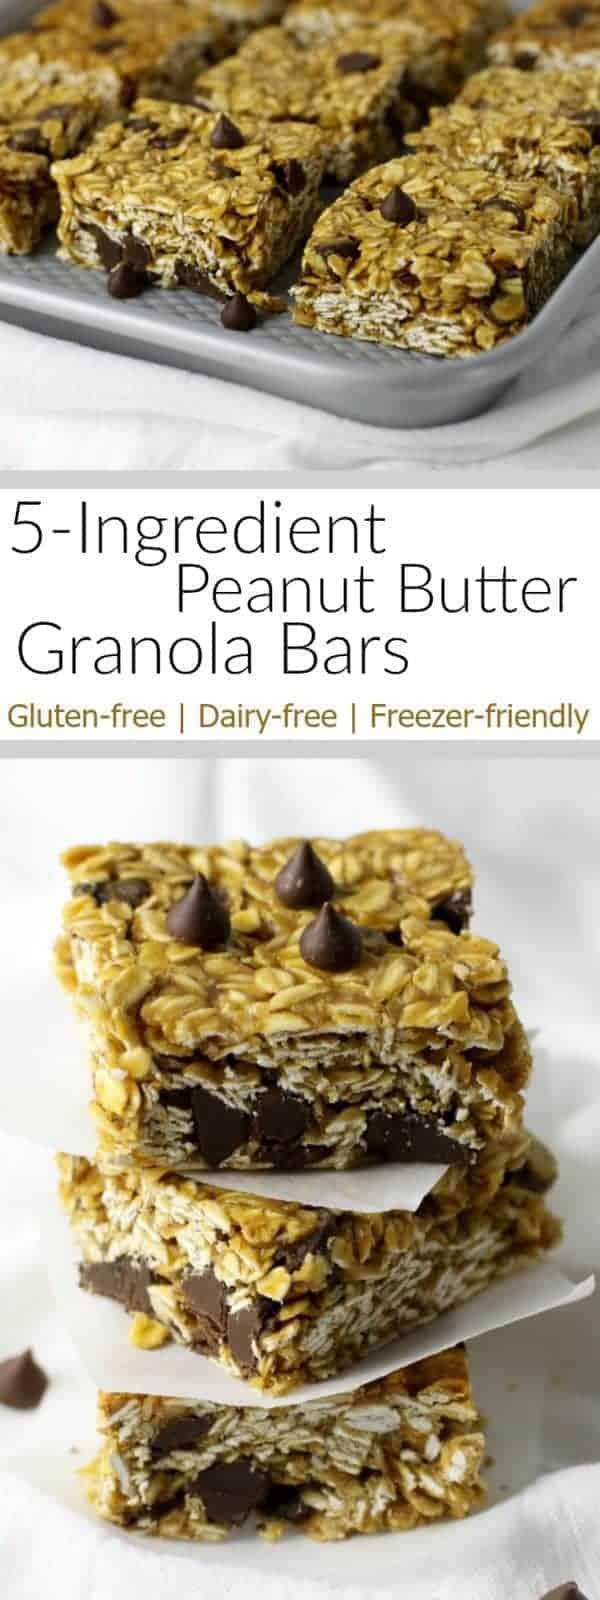 Easy 5 ingredient snack recipes